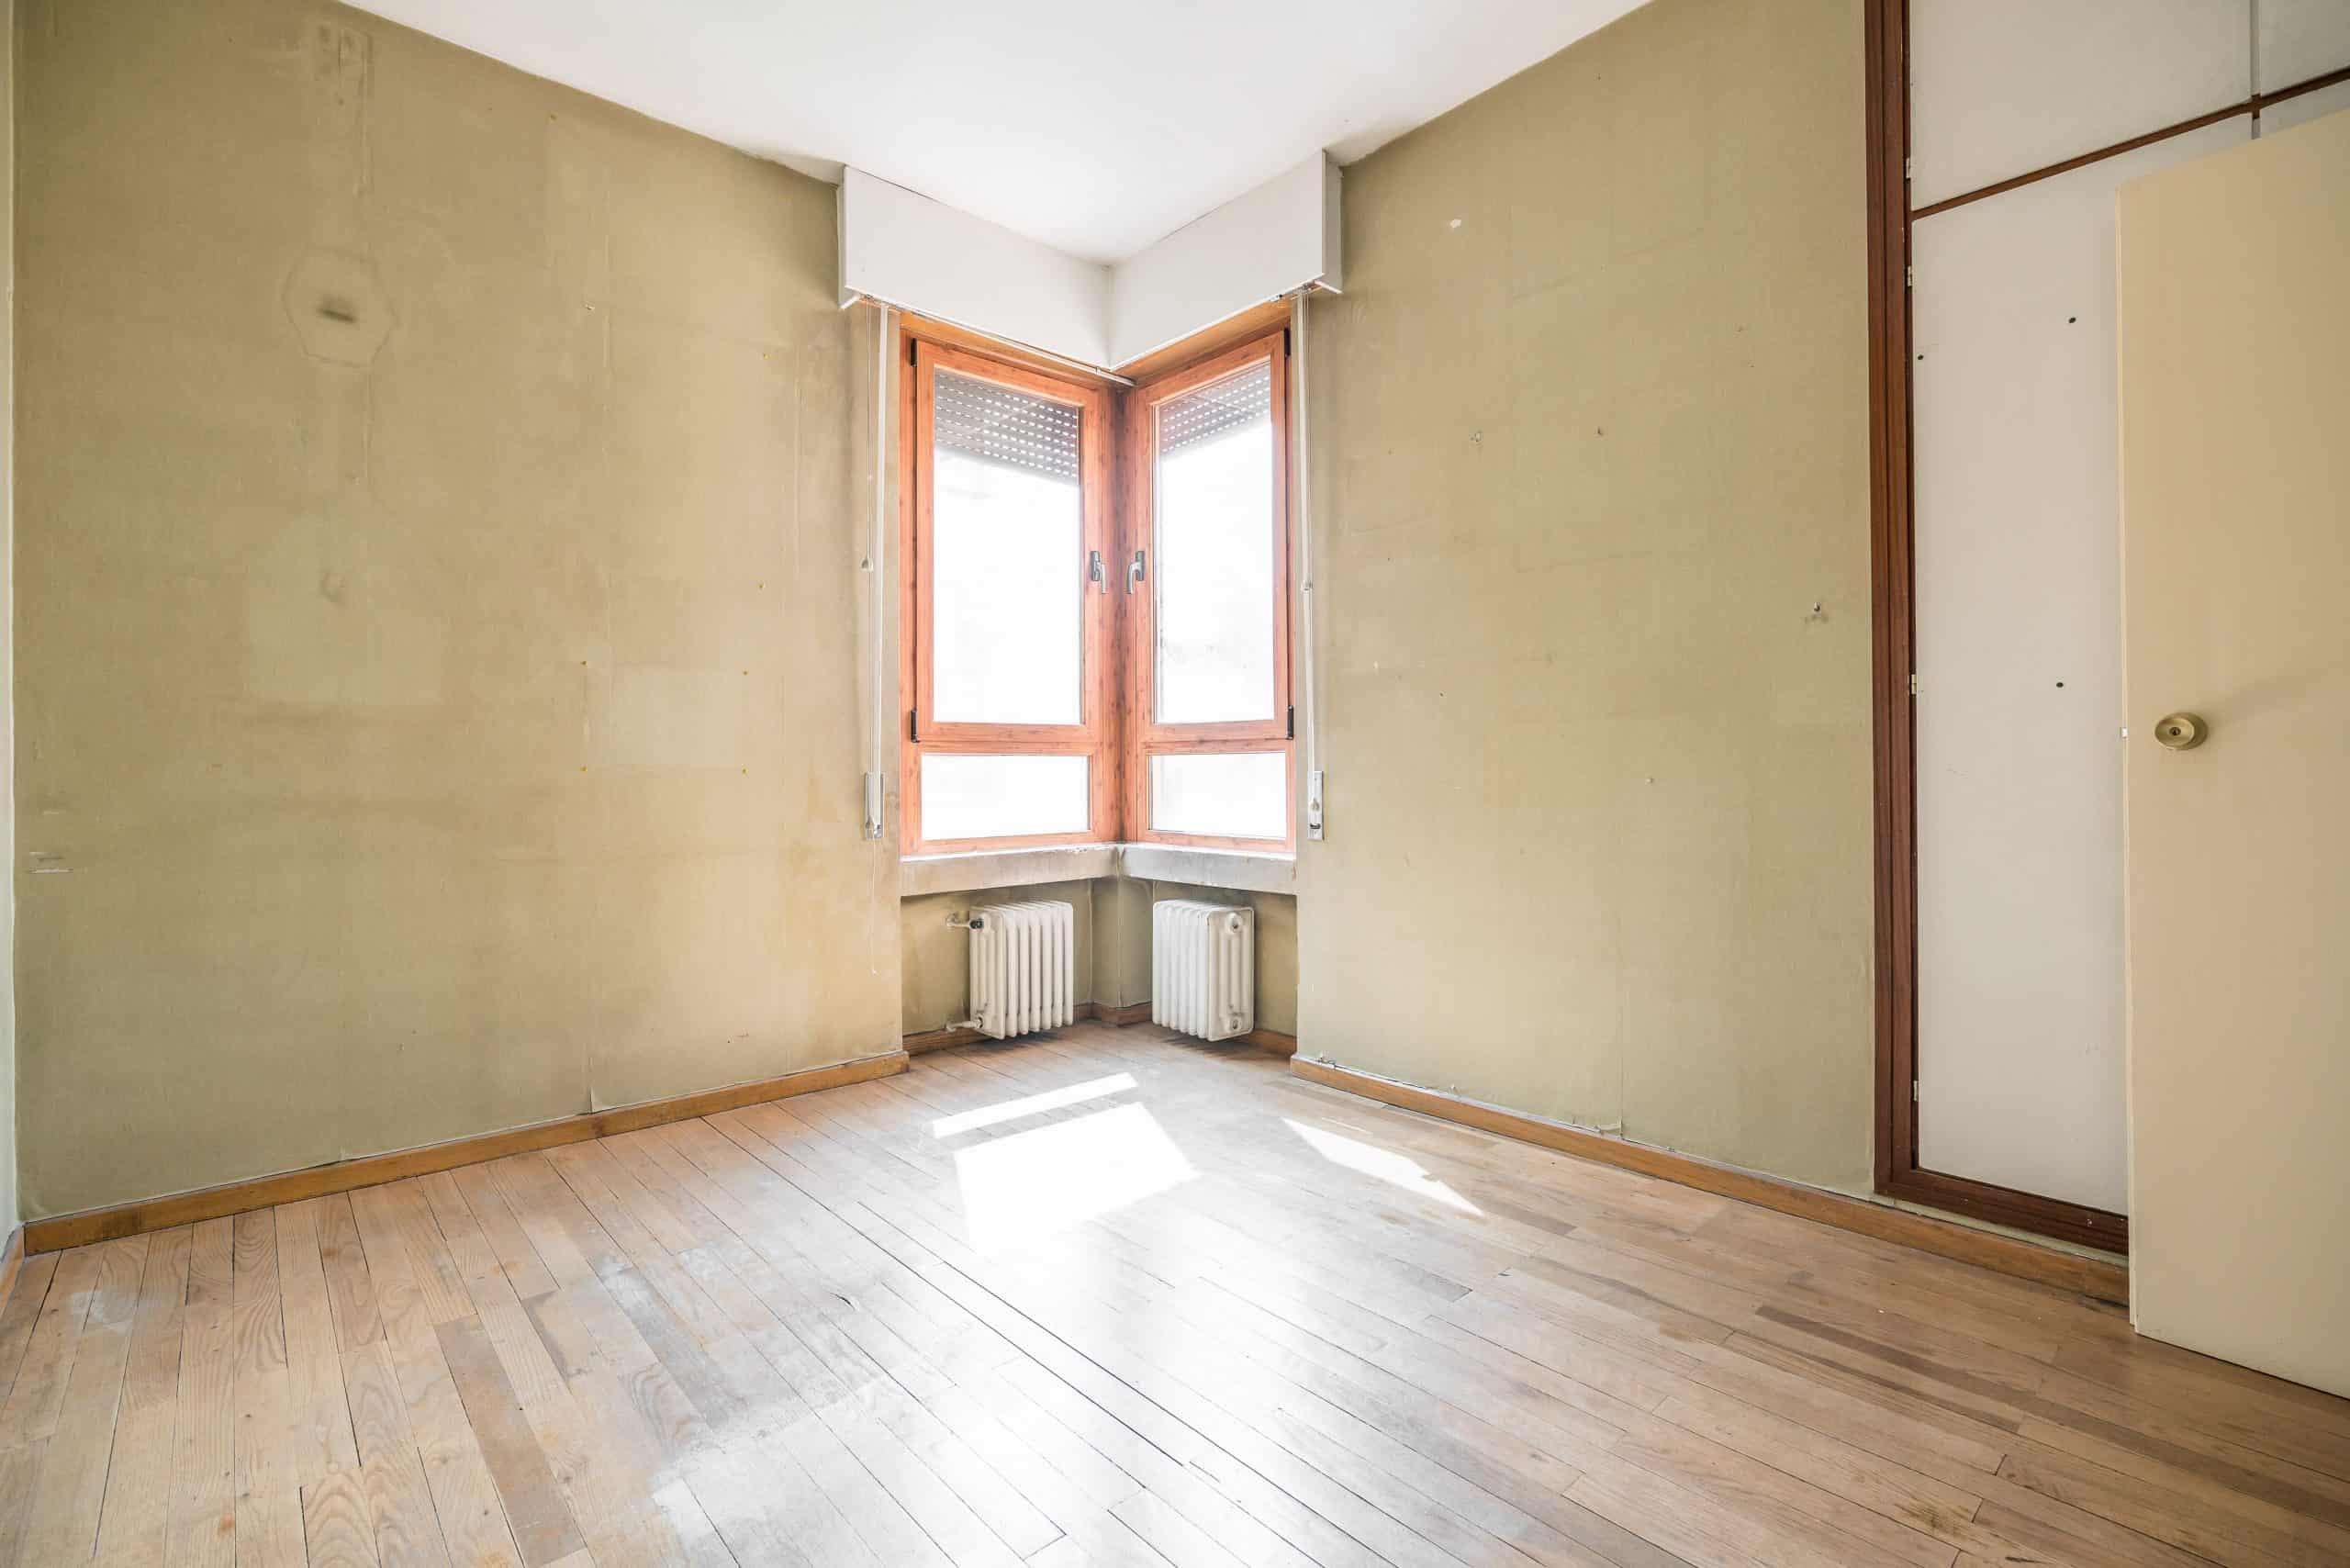 Agencia Inmobiliaria de Madrid-FUTUROCASA-Zona ARGANZUELA-EMBAJADORES-LEGAZPI -calle Embajadores- baño 138